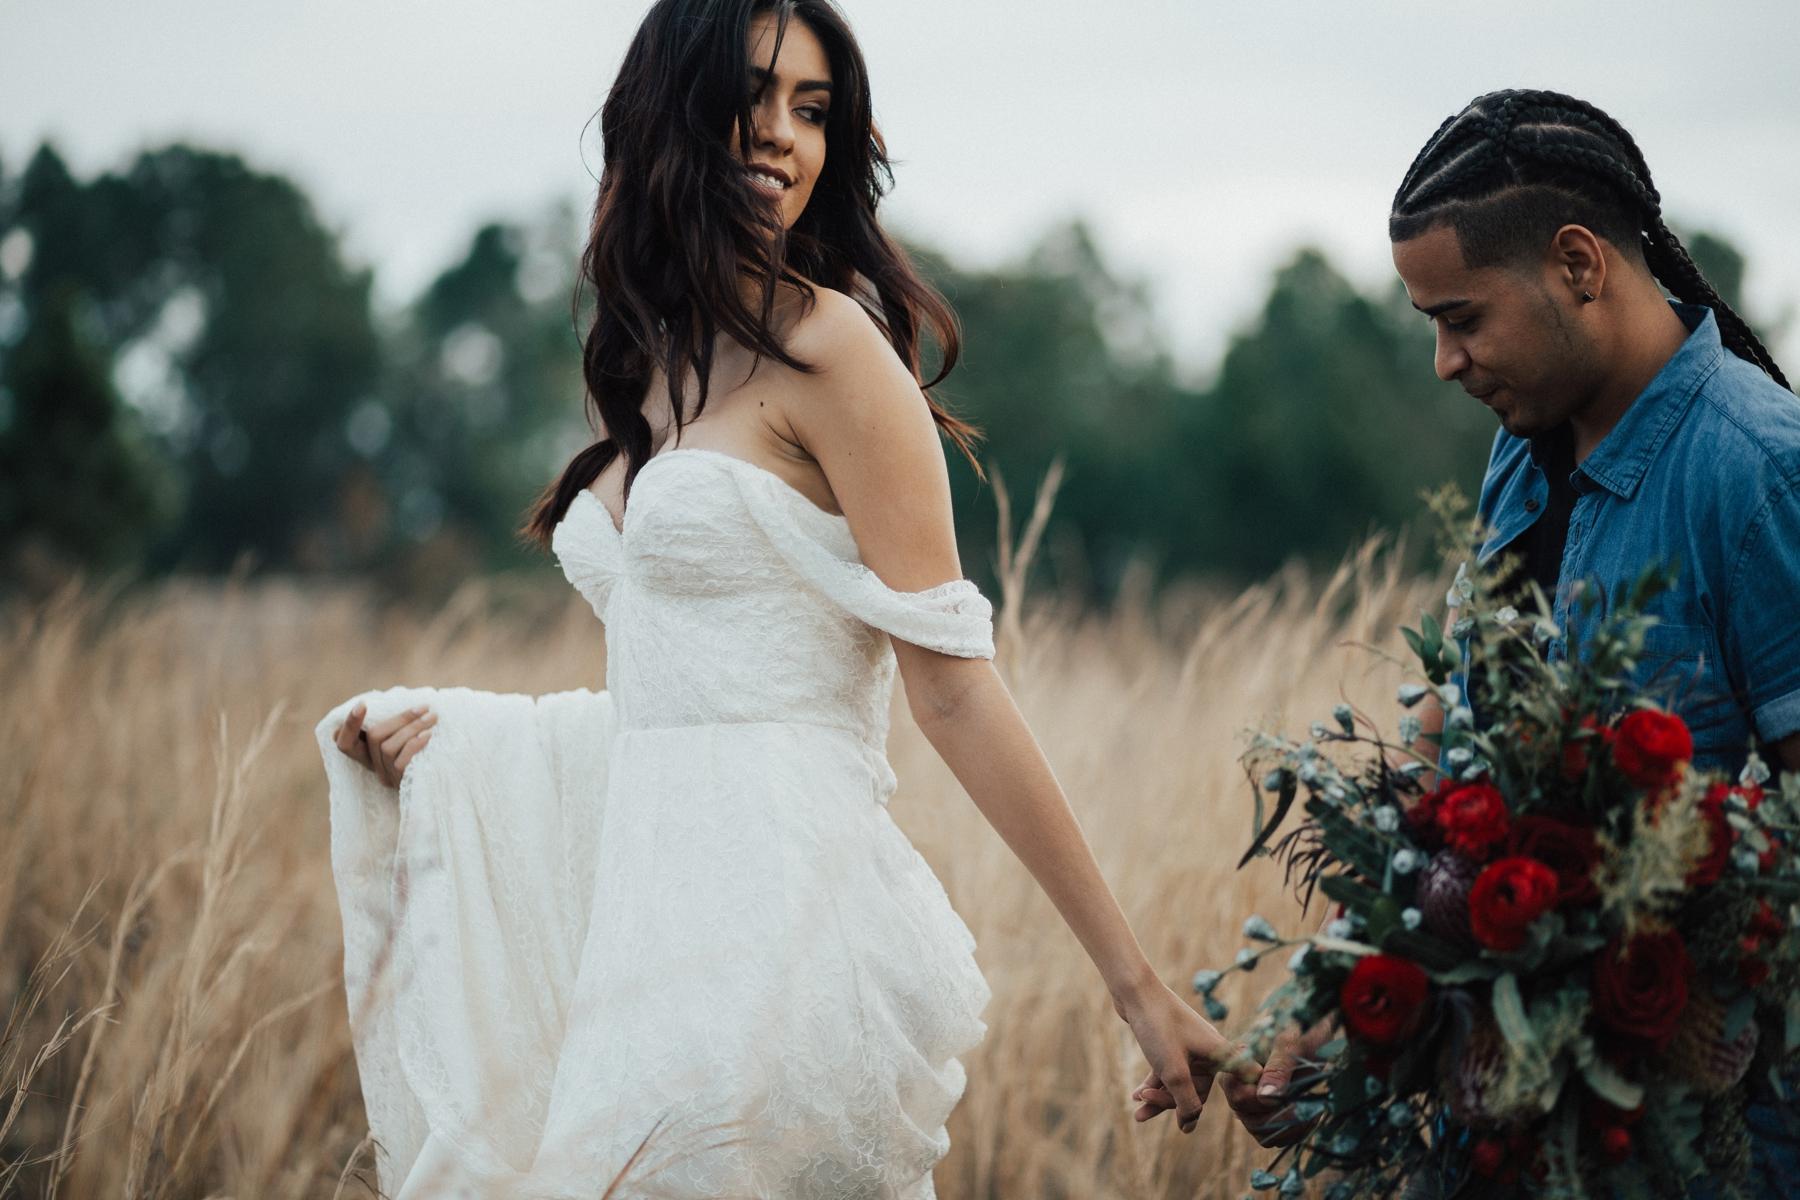 fashion-bridal-02.jpg